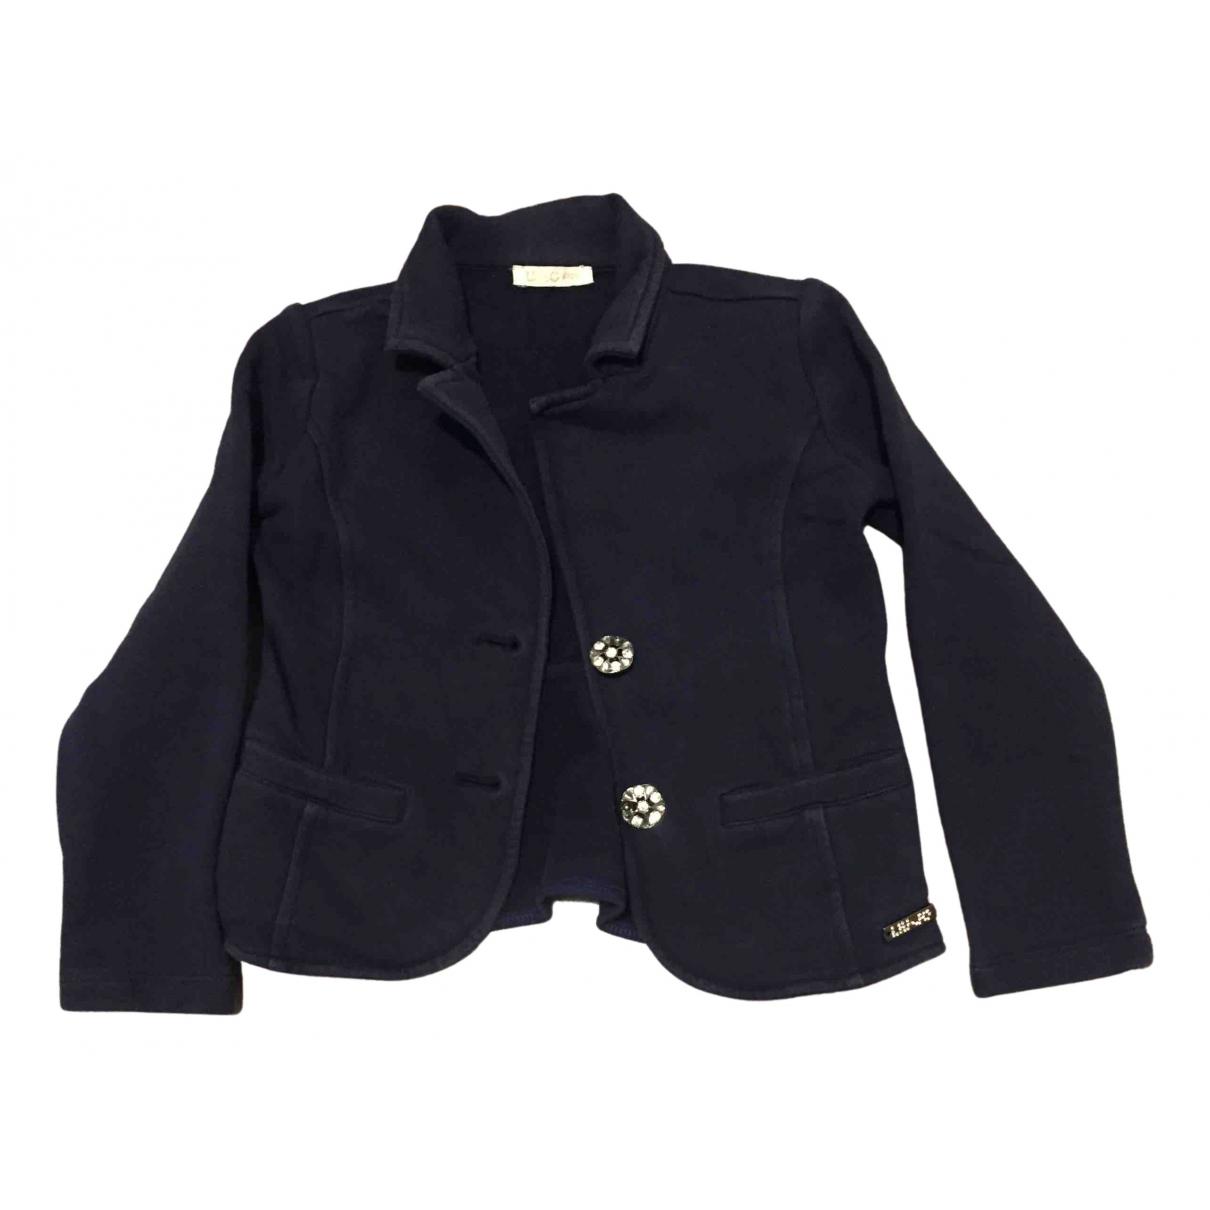 Liu.jo - Top   pour enfant en coton - bleu